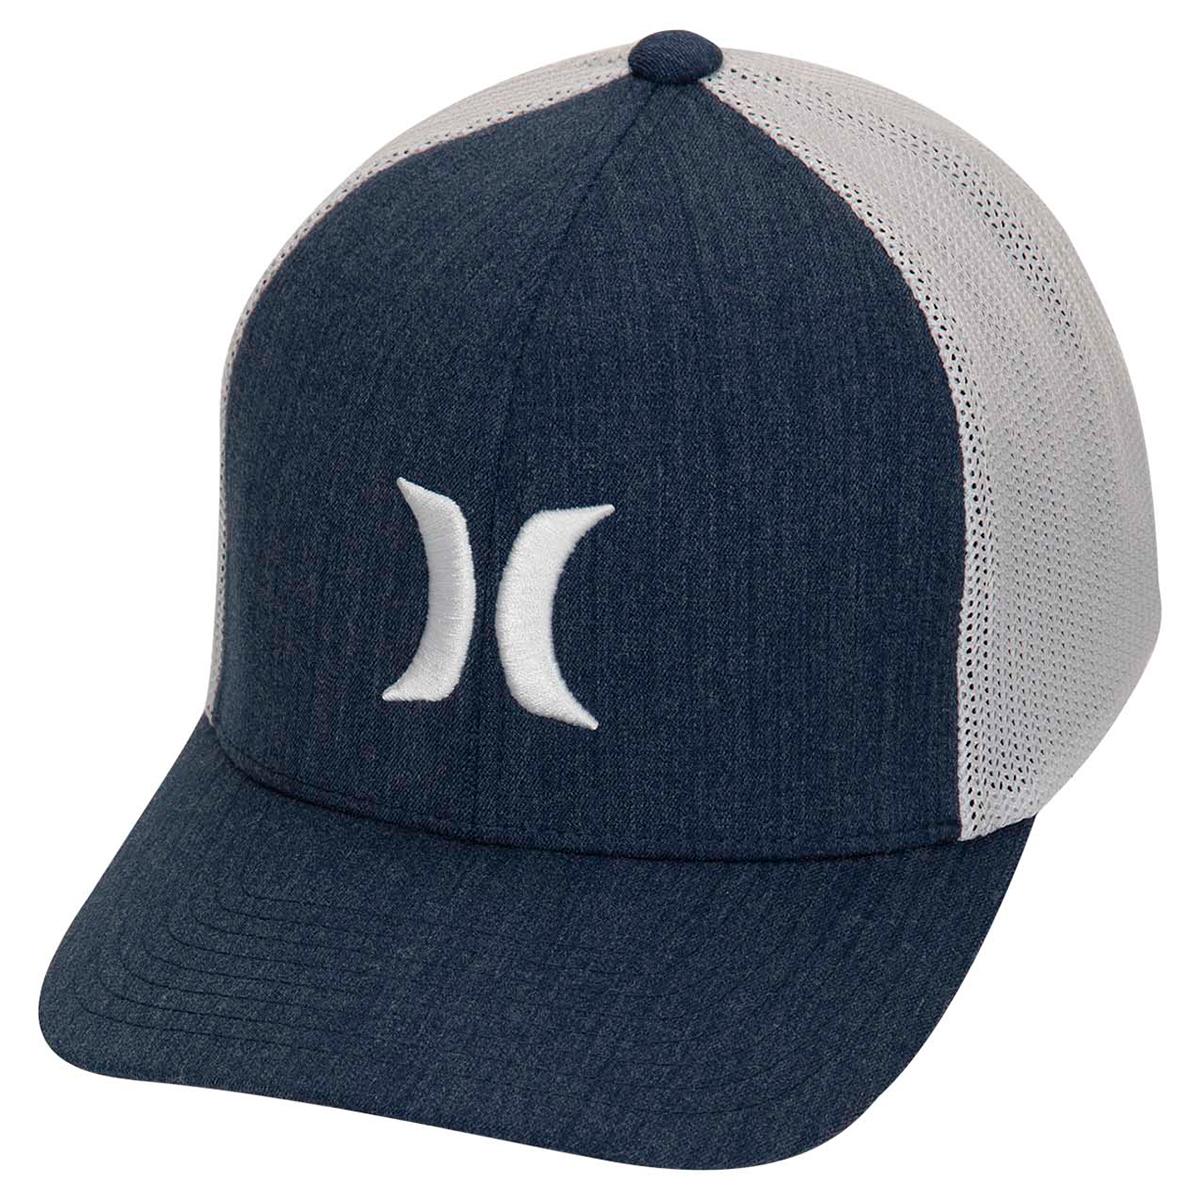 Hurley Men's Icon Textures Hat - Blue, L/XL